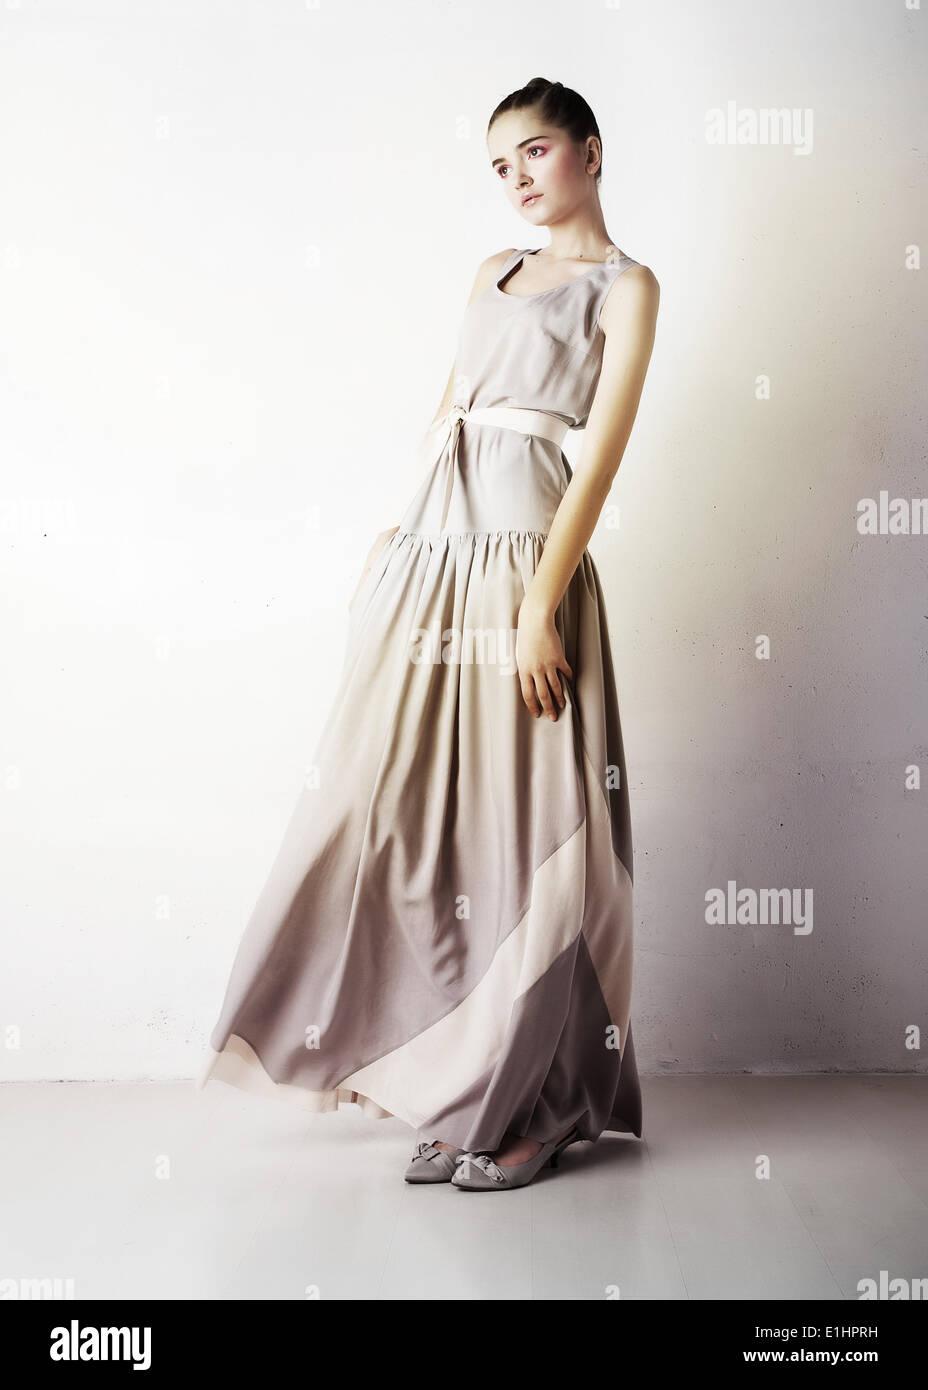 Romantic young woman beauty wearing white fashion dress - Stock Image